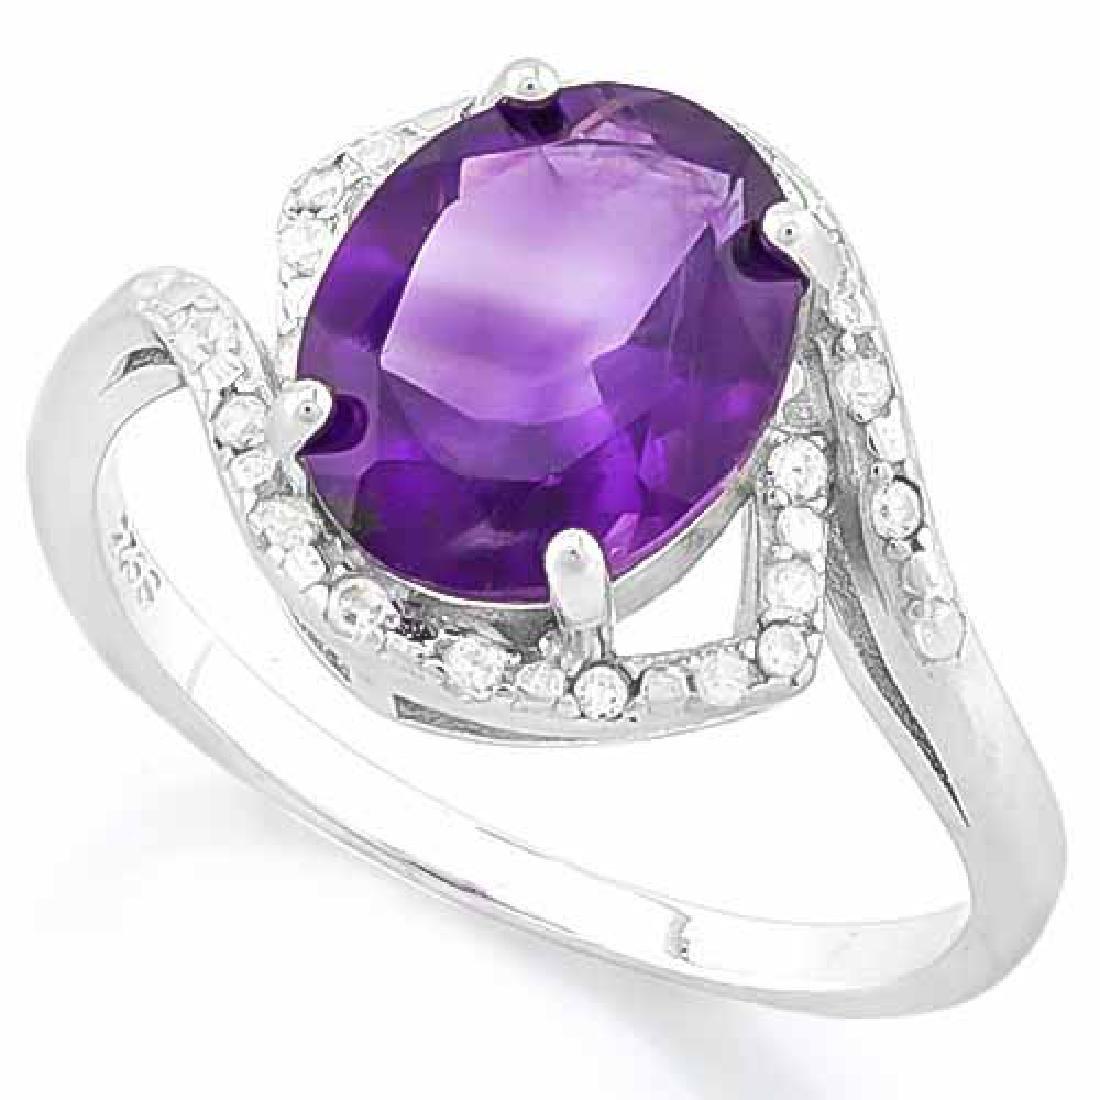 AMETHYST & 1/4 CARAT (34 PCS) FLAWLESS CREATED DIAMOND